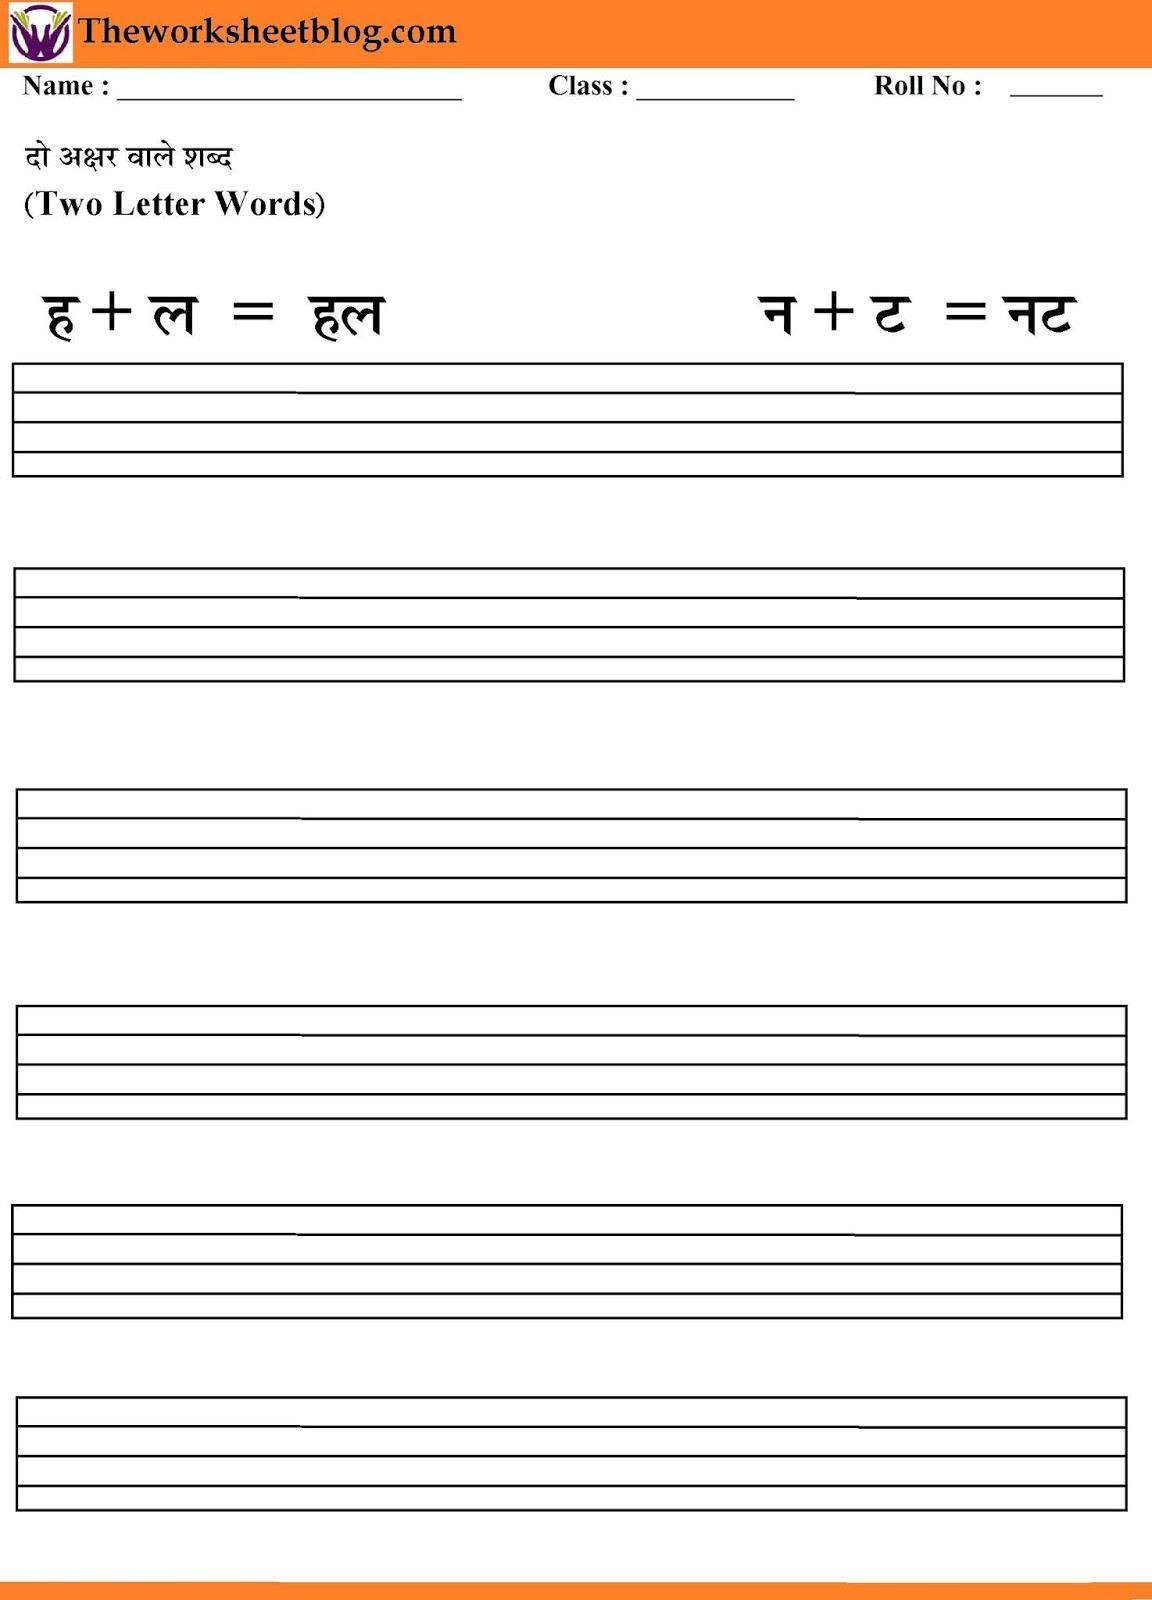 Two letter words worksheet in Hindi - Theworksheetsblog